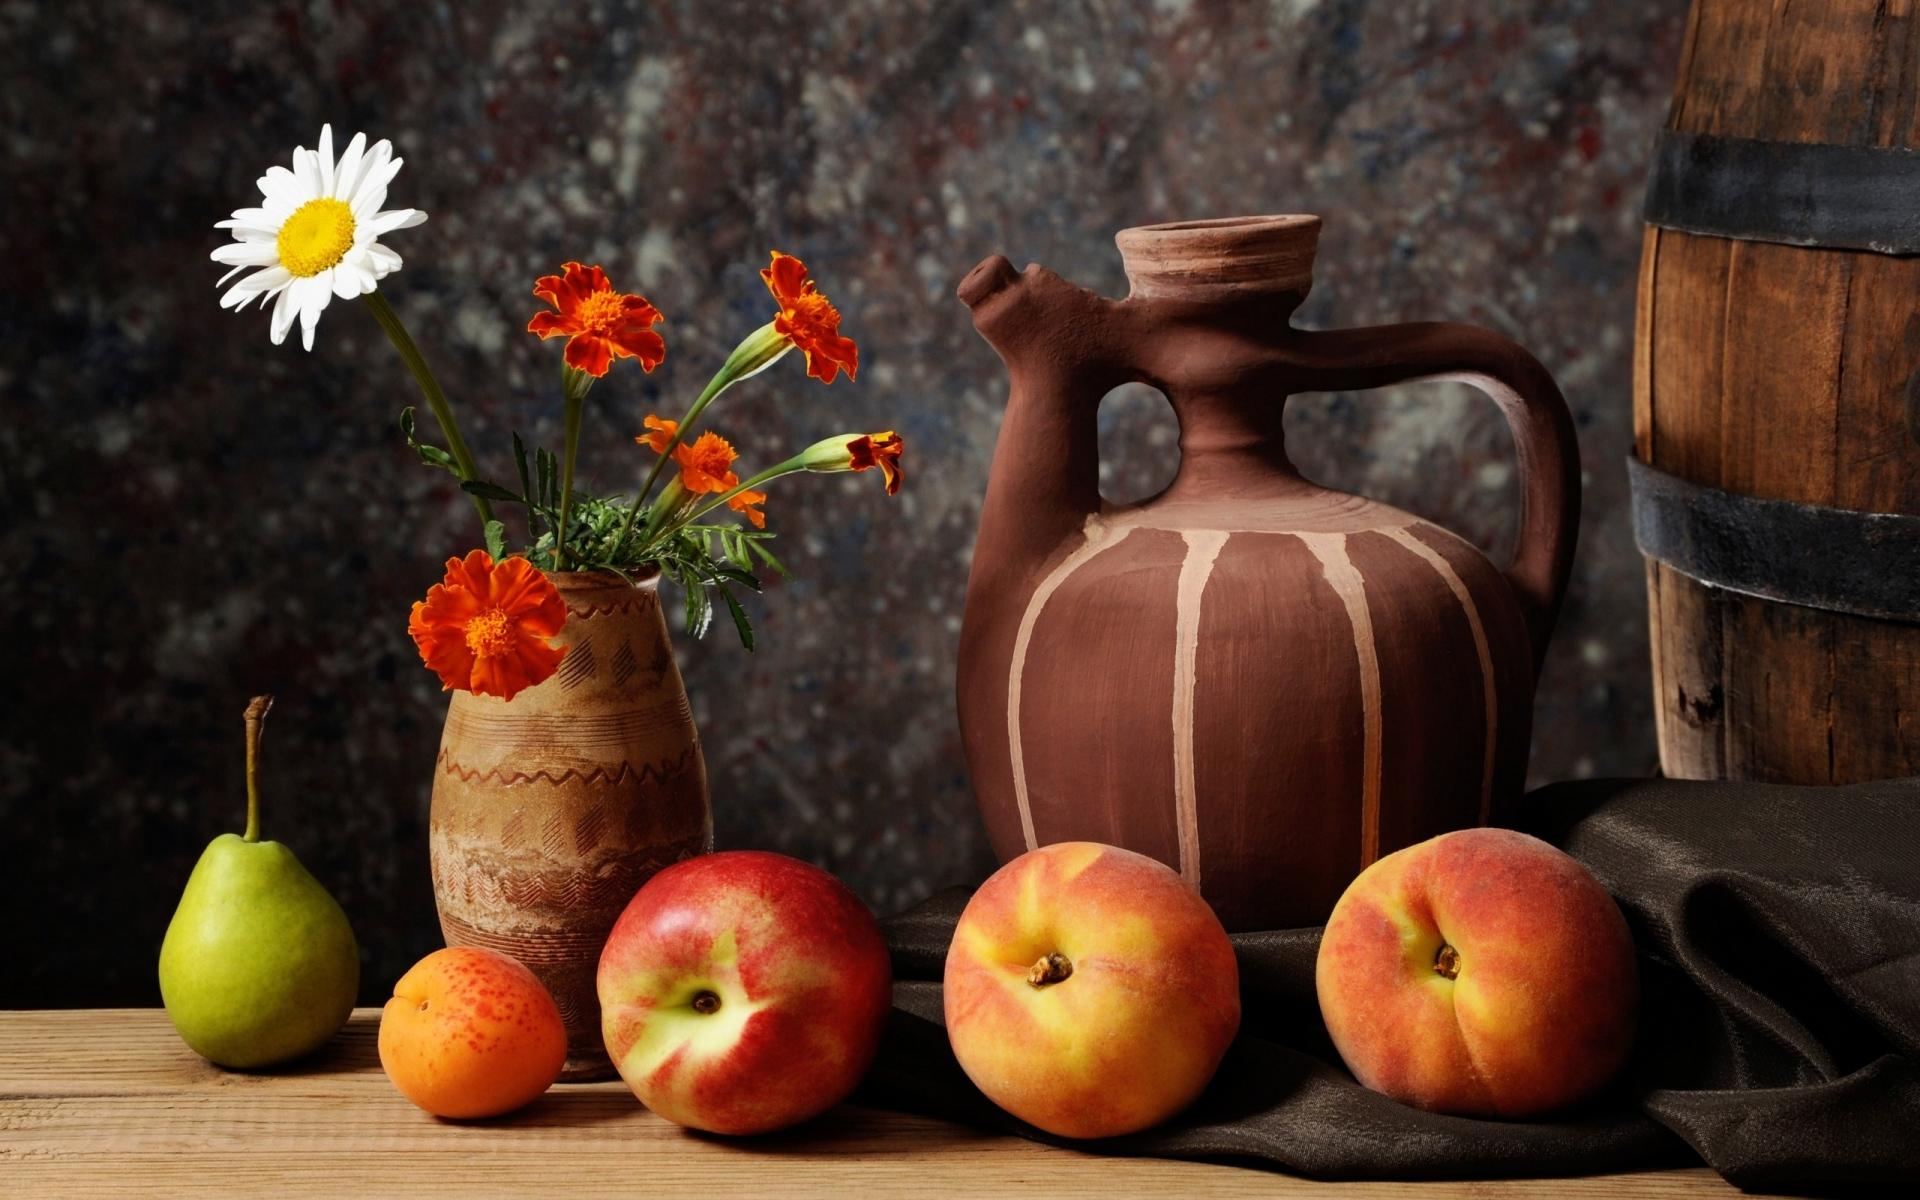 Картинки Груша, фрукты, абрикос, нектарин фото и обои на рабочий стол